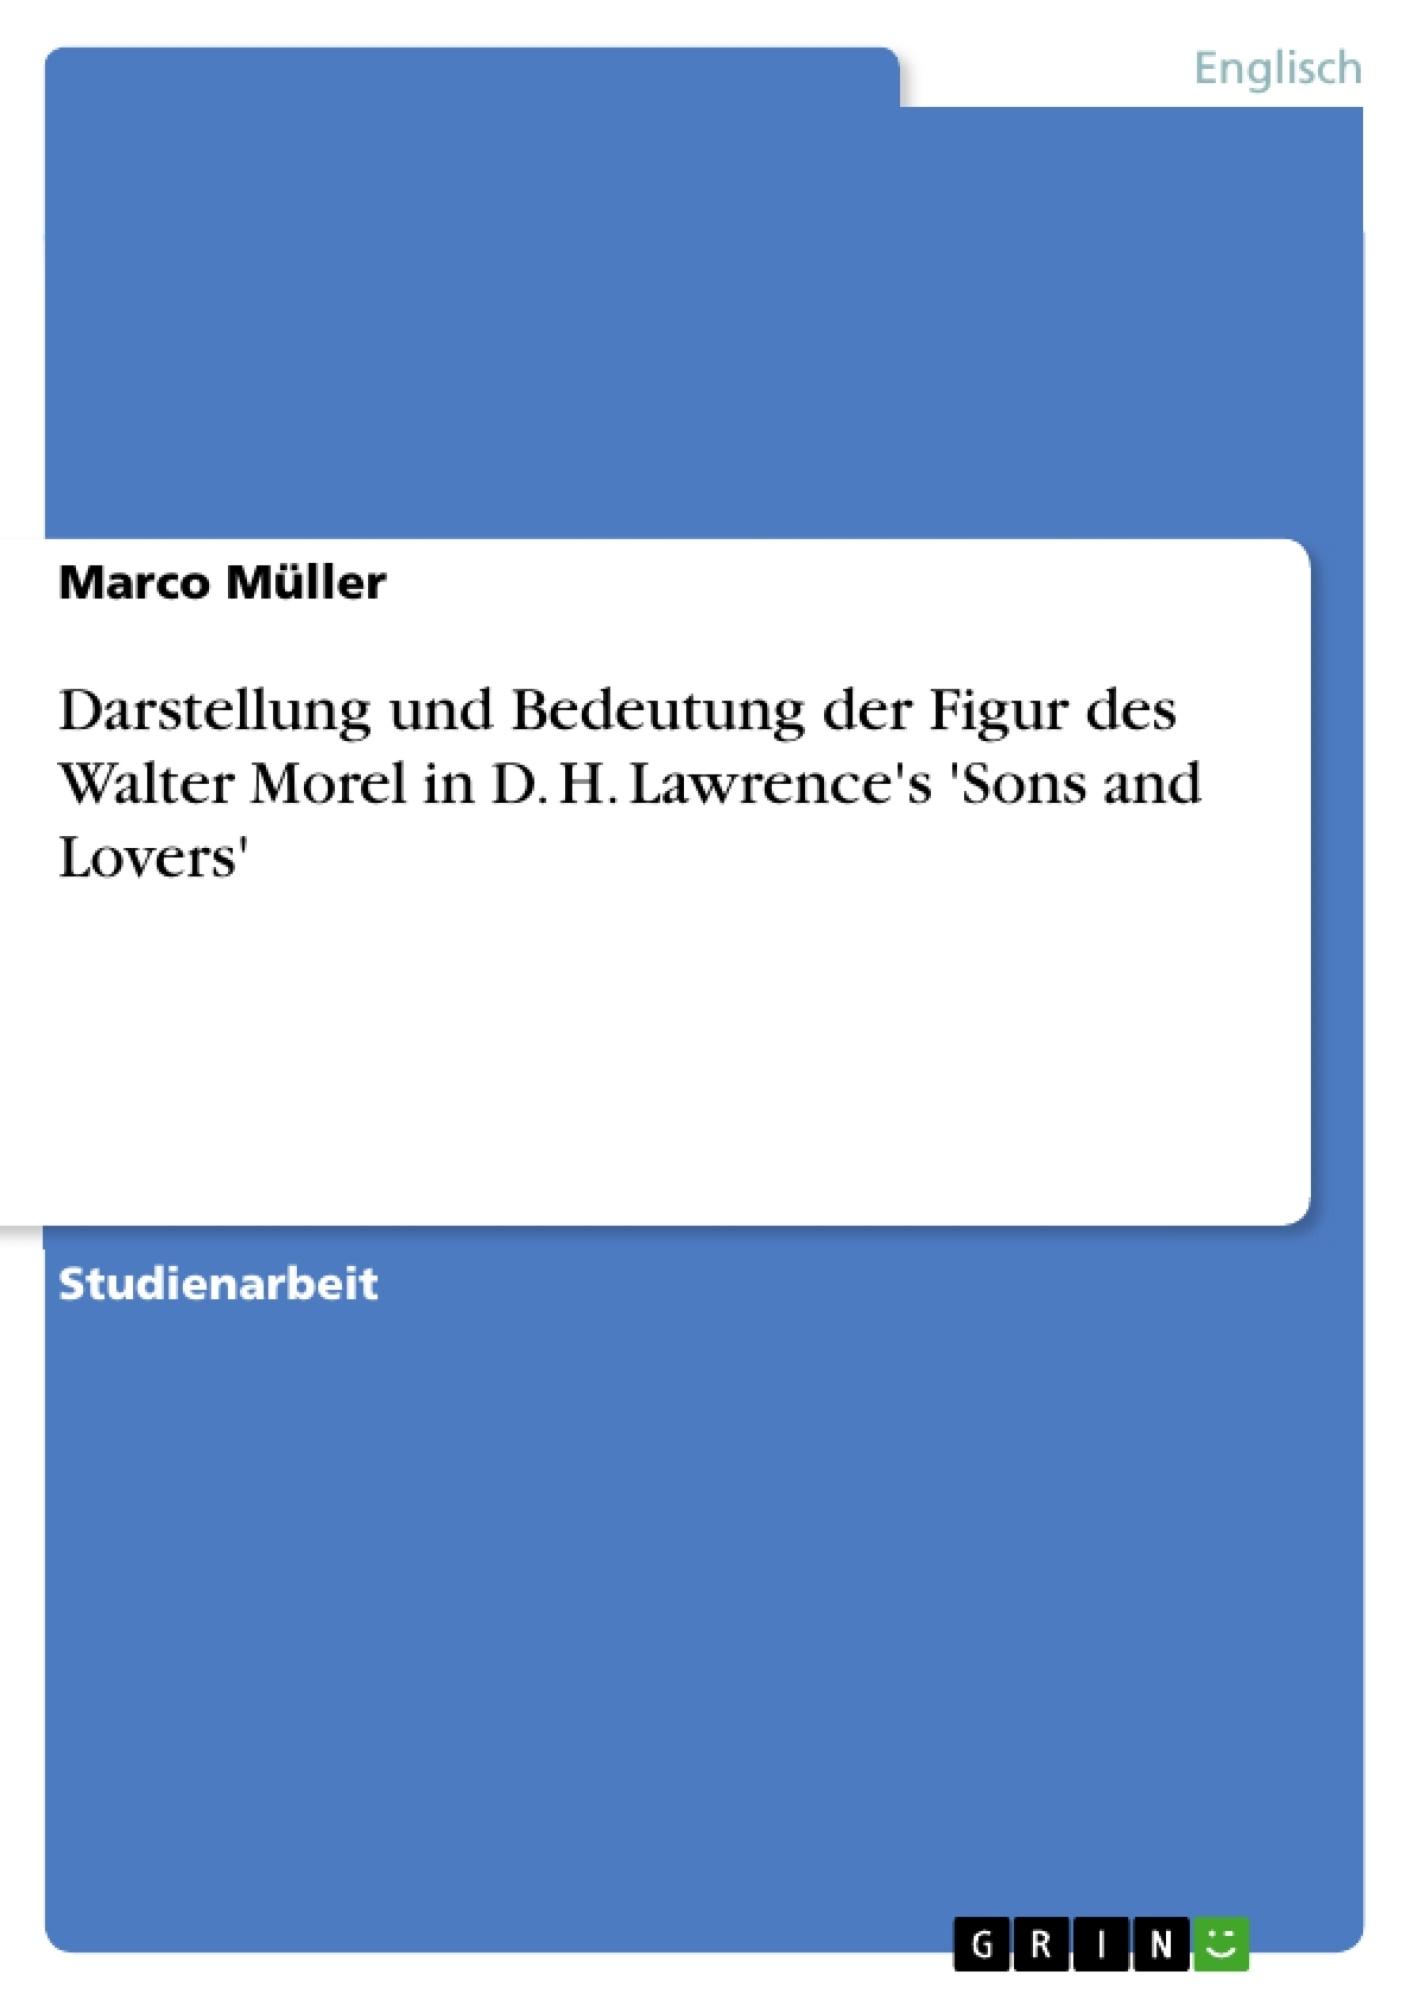 Titel: Darstellung und Bedeutung der Figur des Walter Morel in D. H. Lawrence's 'Sons and Lovers'